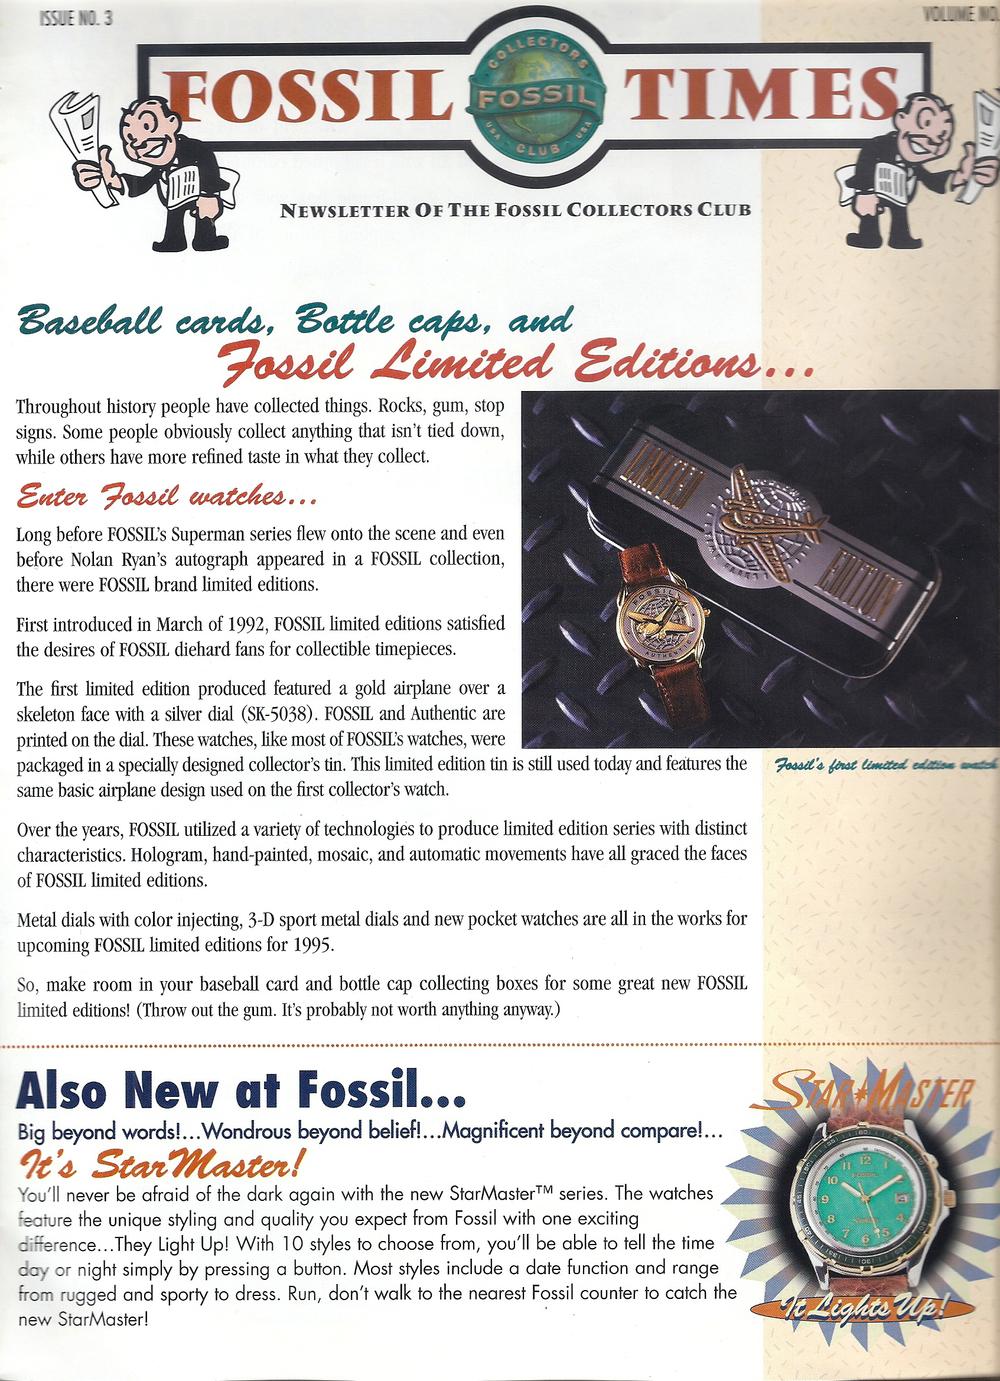 Fossil_Times1.jpg